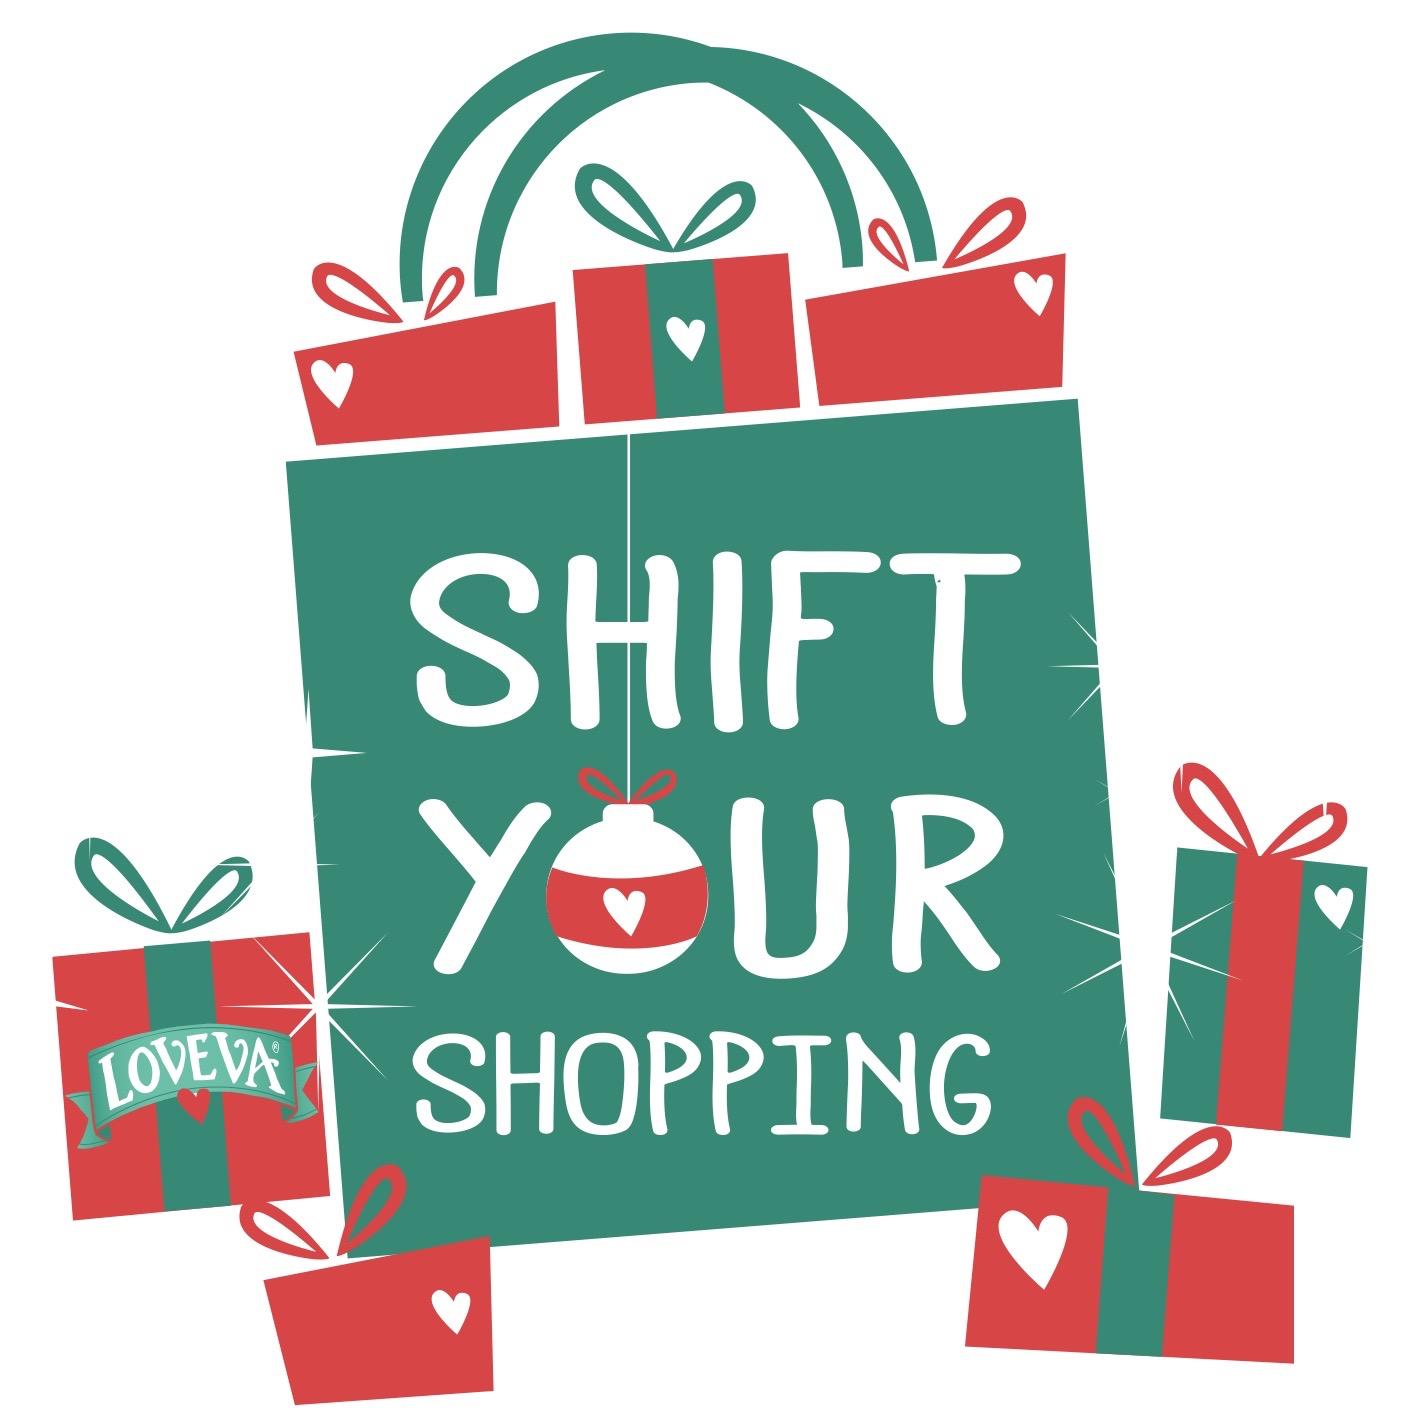 LOVEVA, Shift Your Shopping